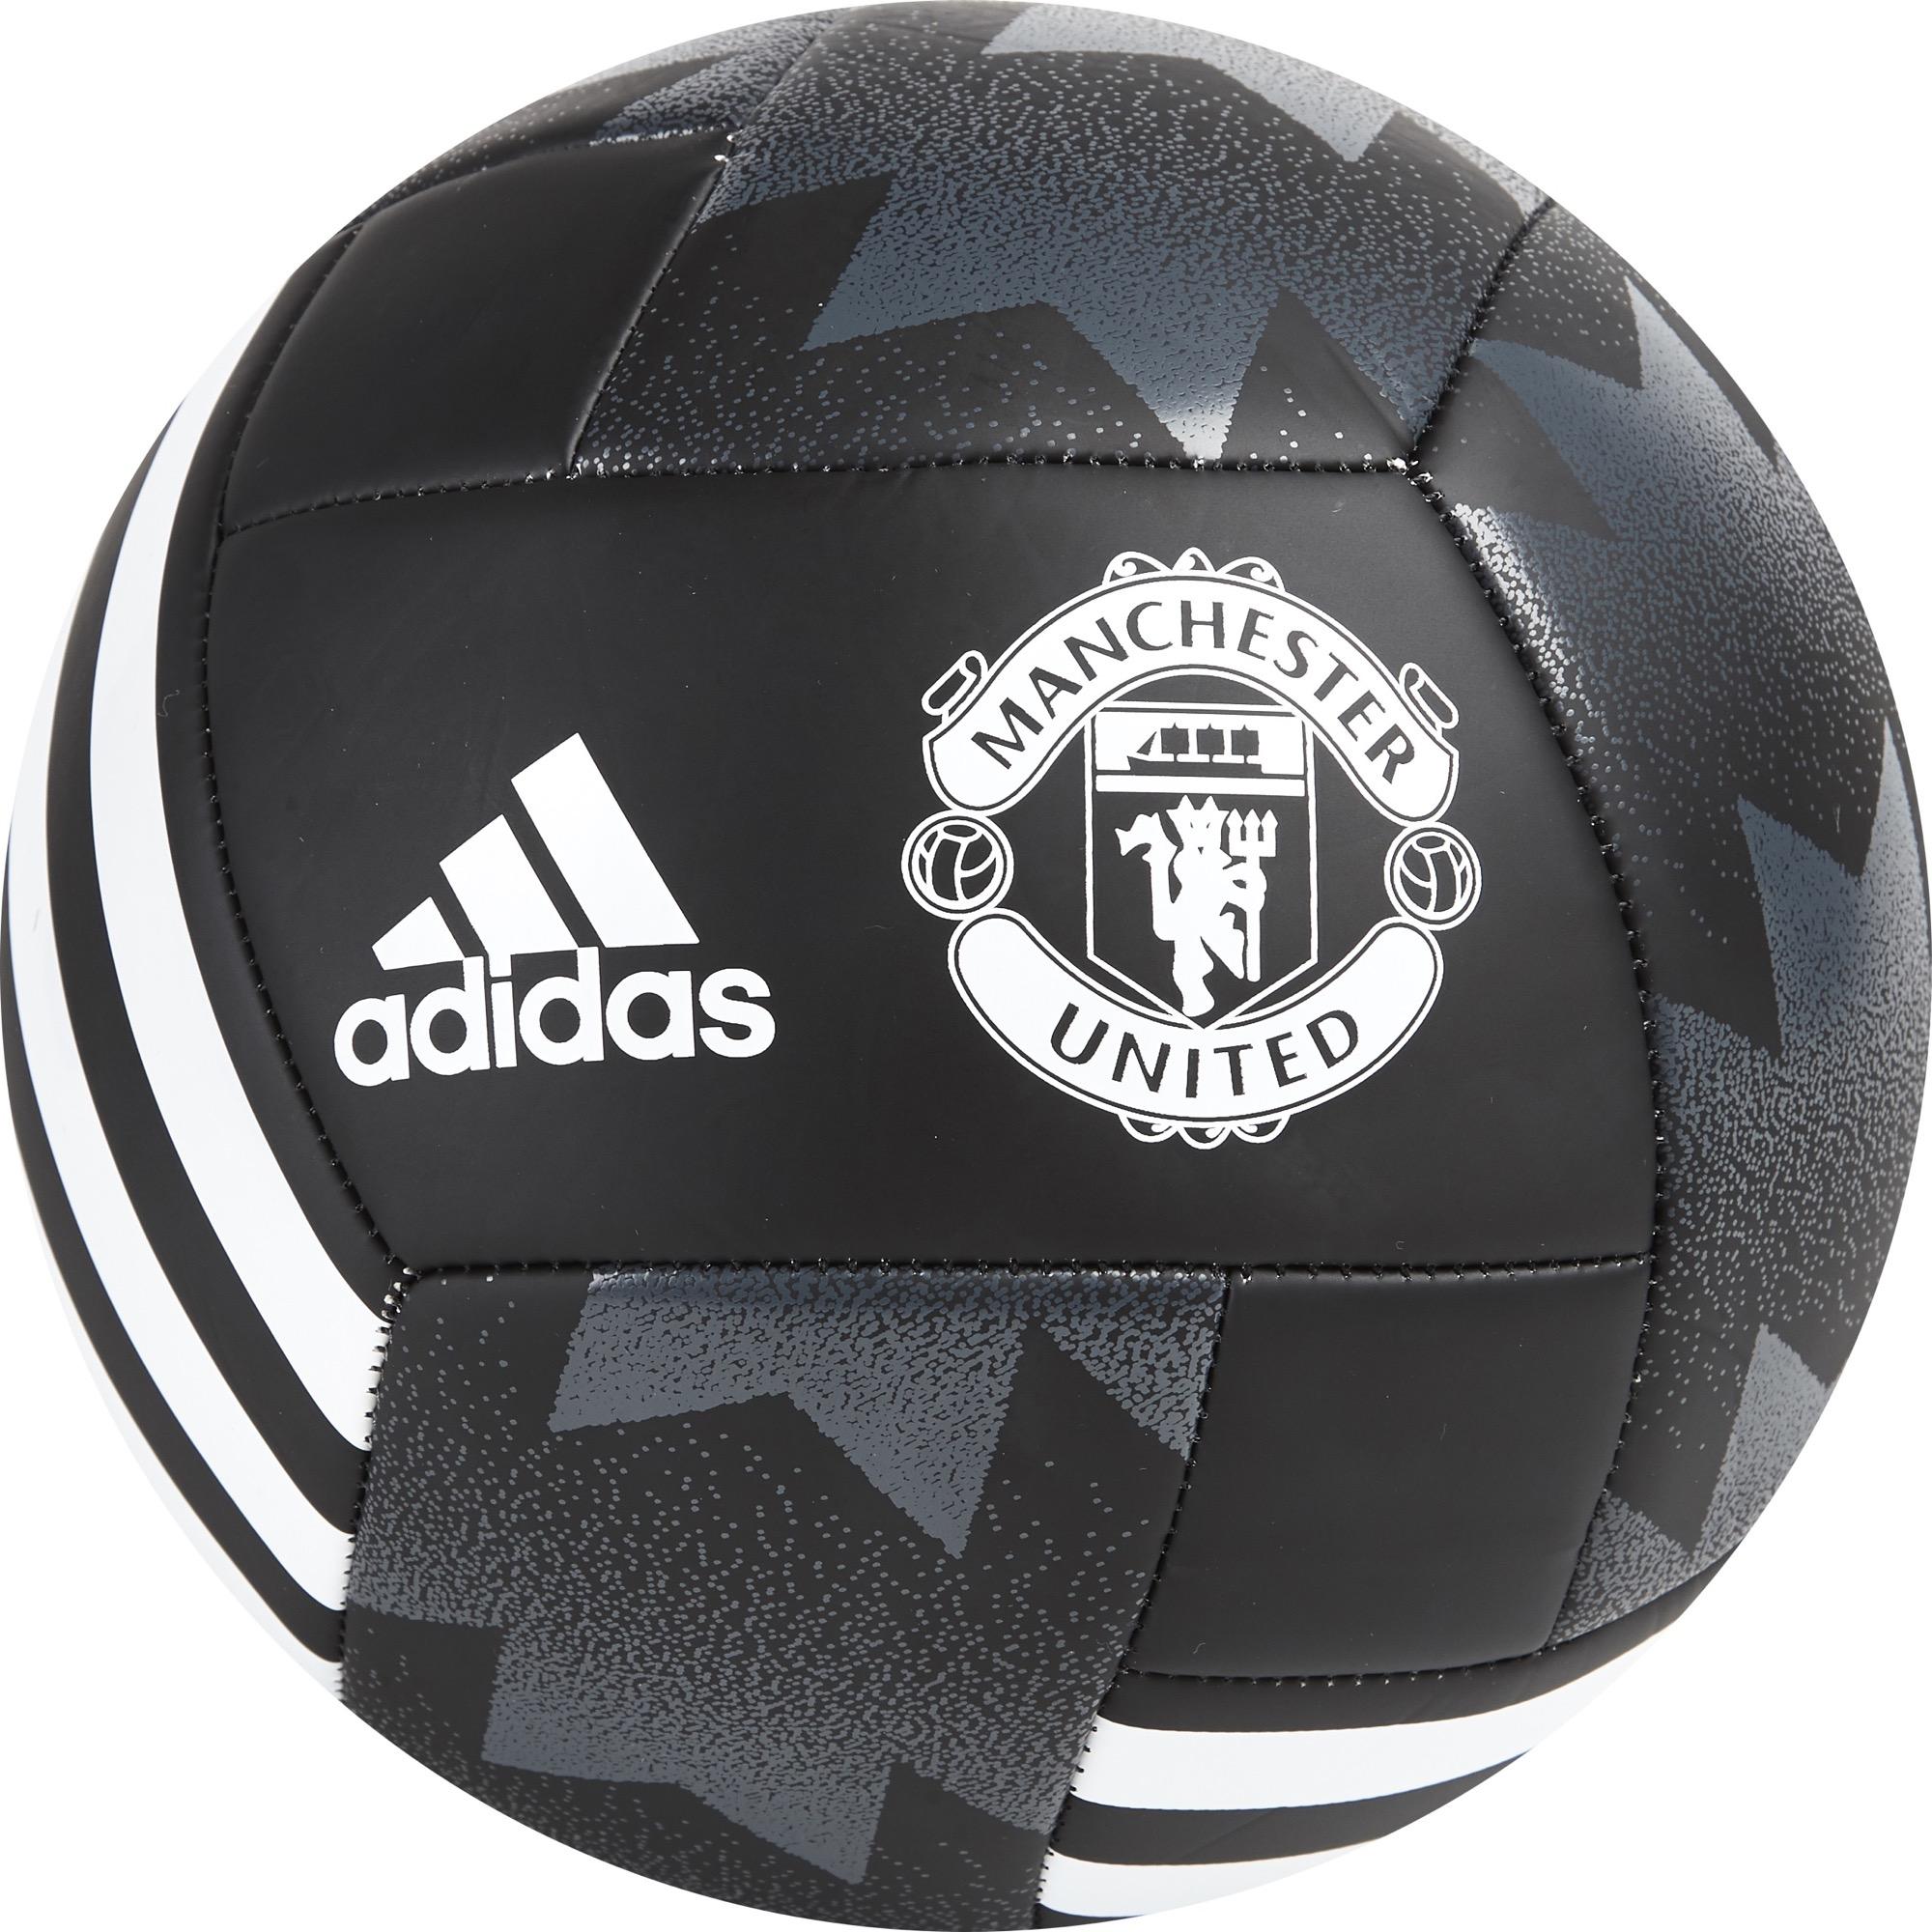 Ballon de football Manchester United-Taille5-Noir/Blanc